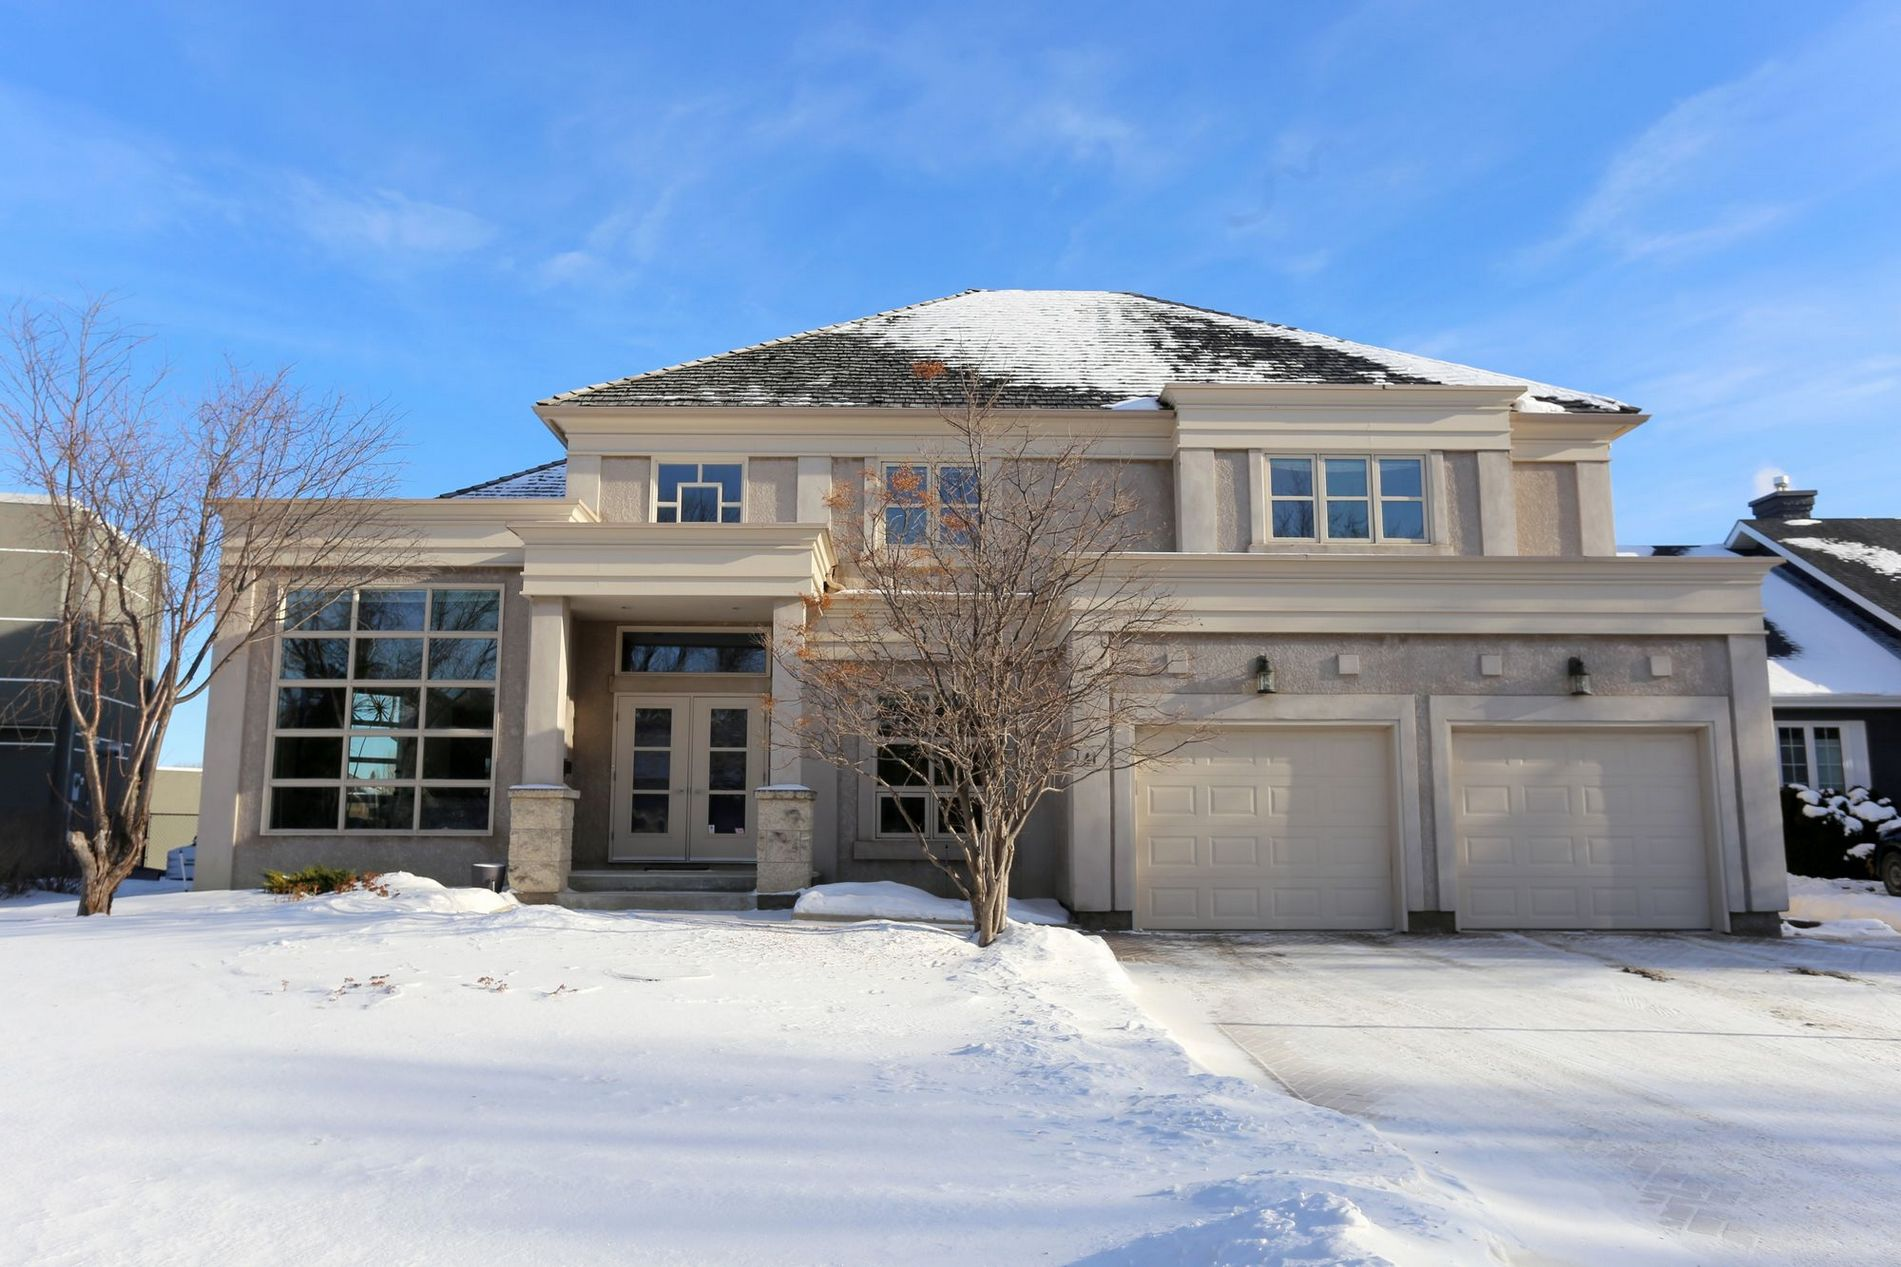 41 Kerslake Drive, Winnipeg, Manitoba  R3P 2C8 - Photo 29 - 1800686